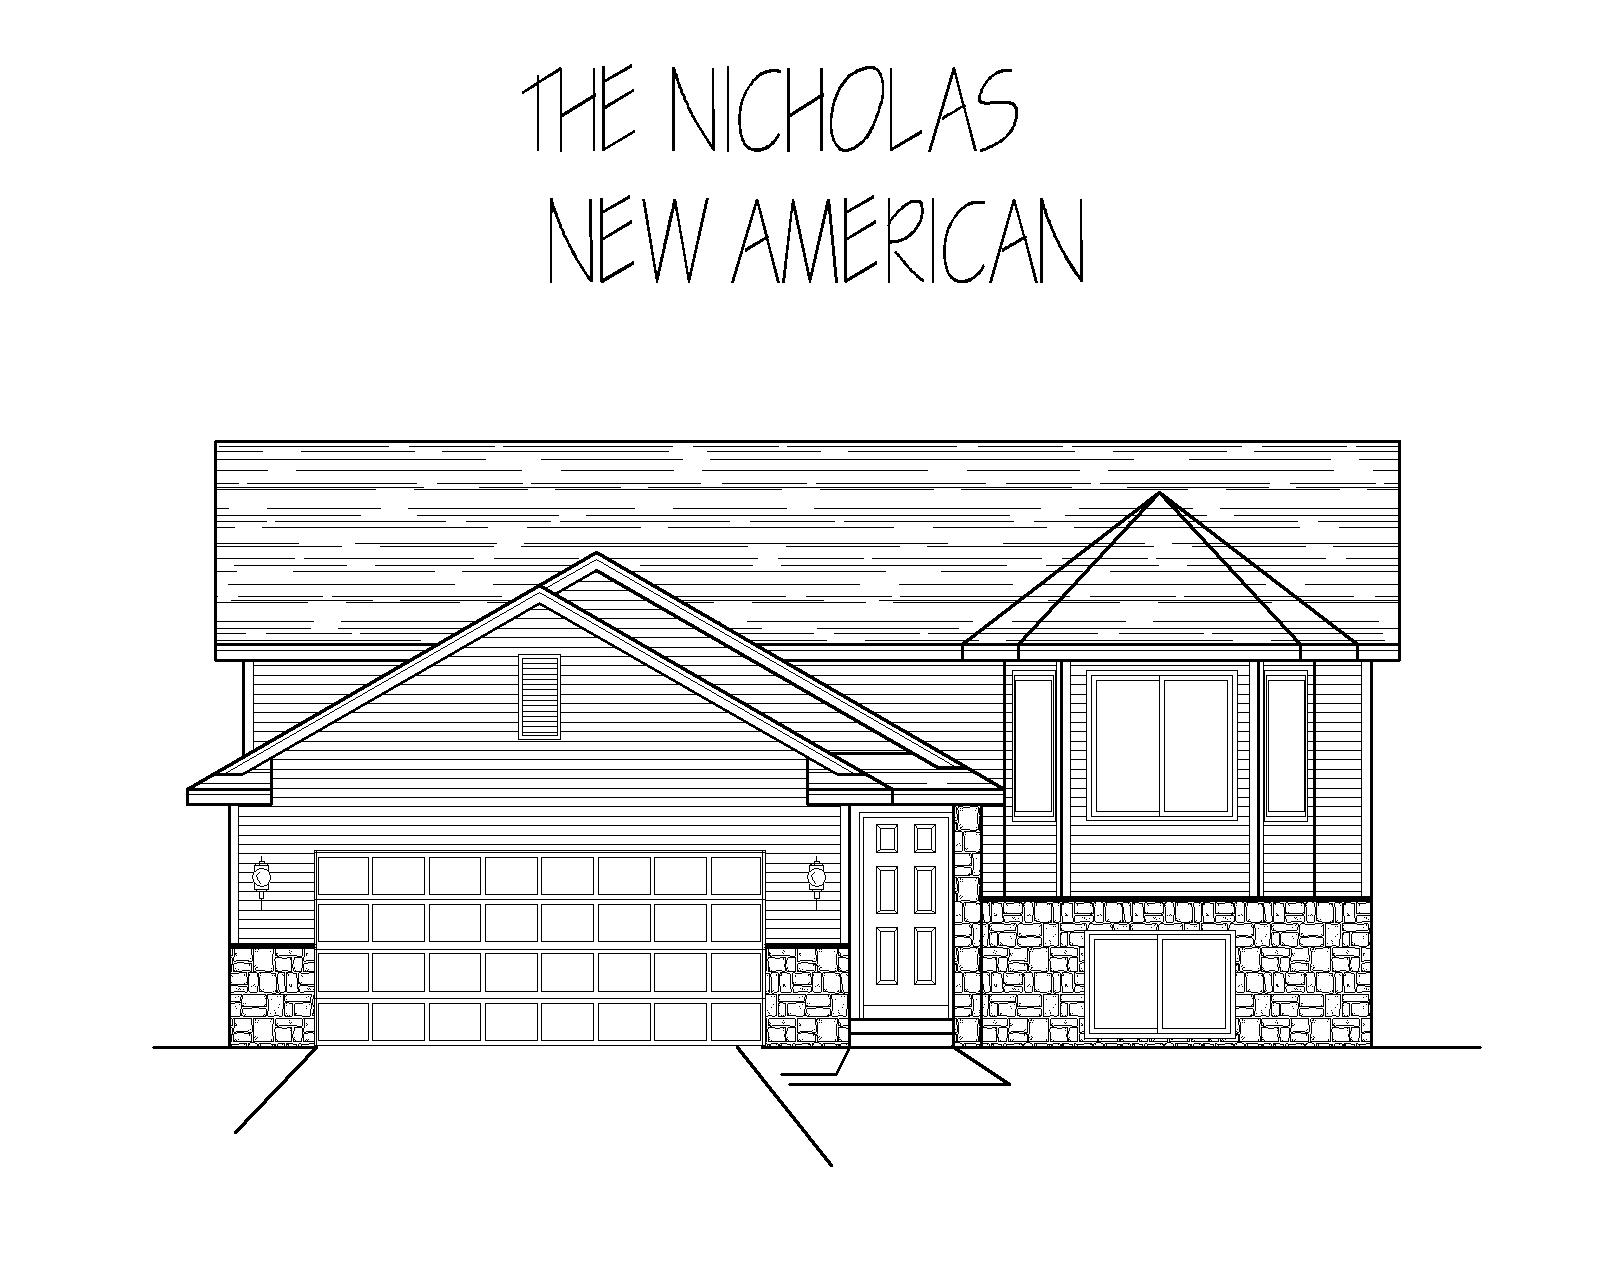 New American style Nicholas